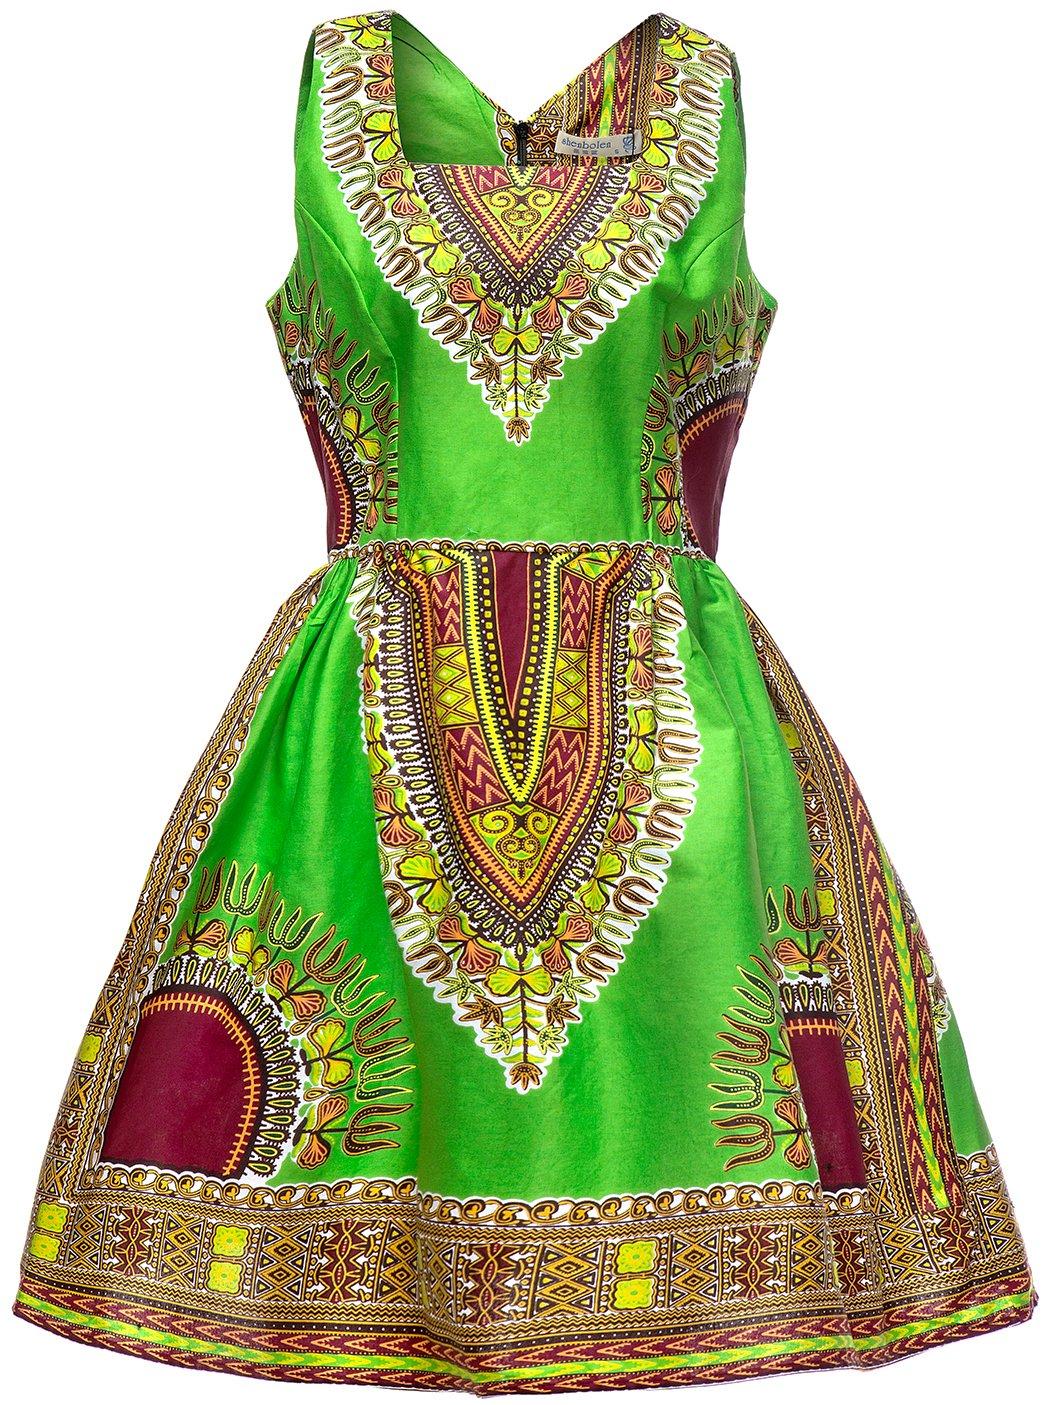 Shenbolen Woman African Print Dress Dashiki Traditional Dress Party Dresses (Small, E)